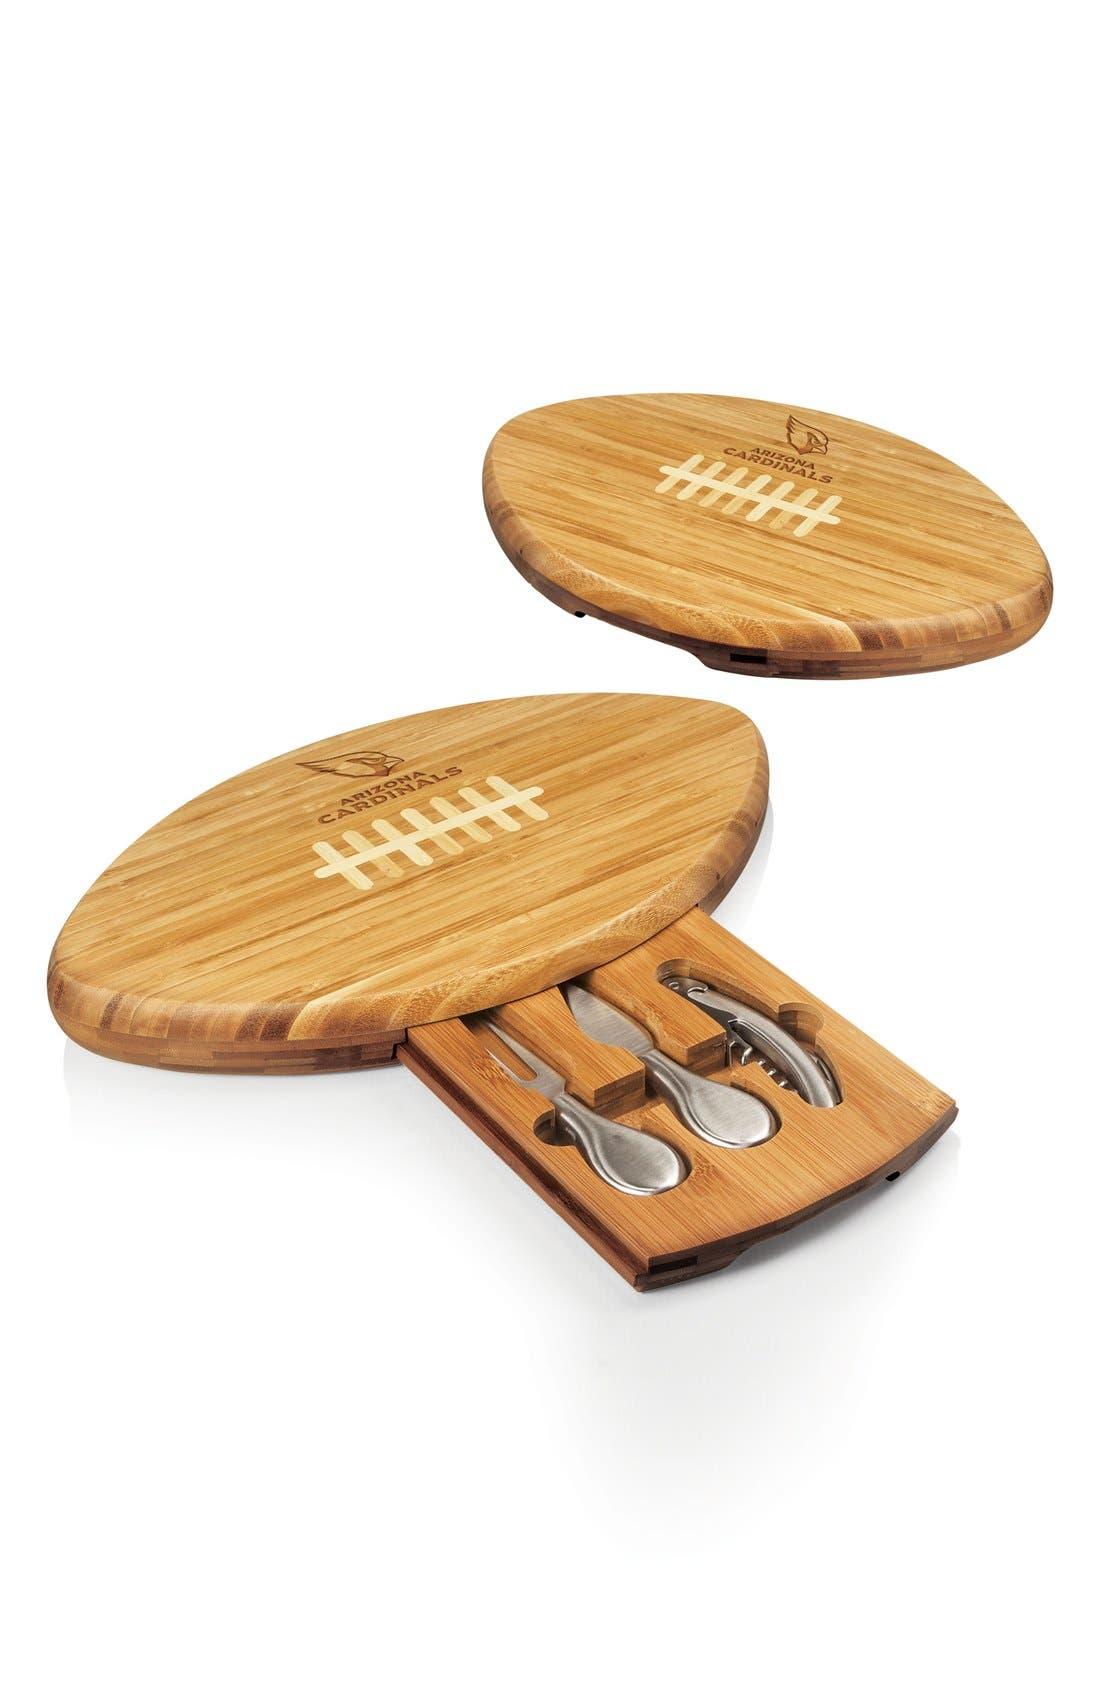 'Quarterback' NFL Engraved Cutting Board & Knives,                             Alternate thumbnail 2, color,                             200